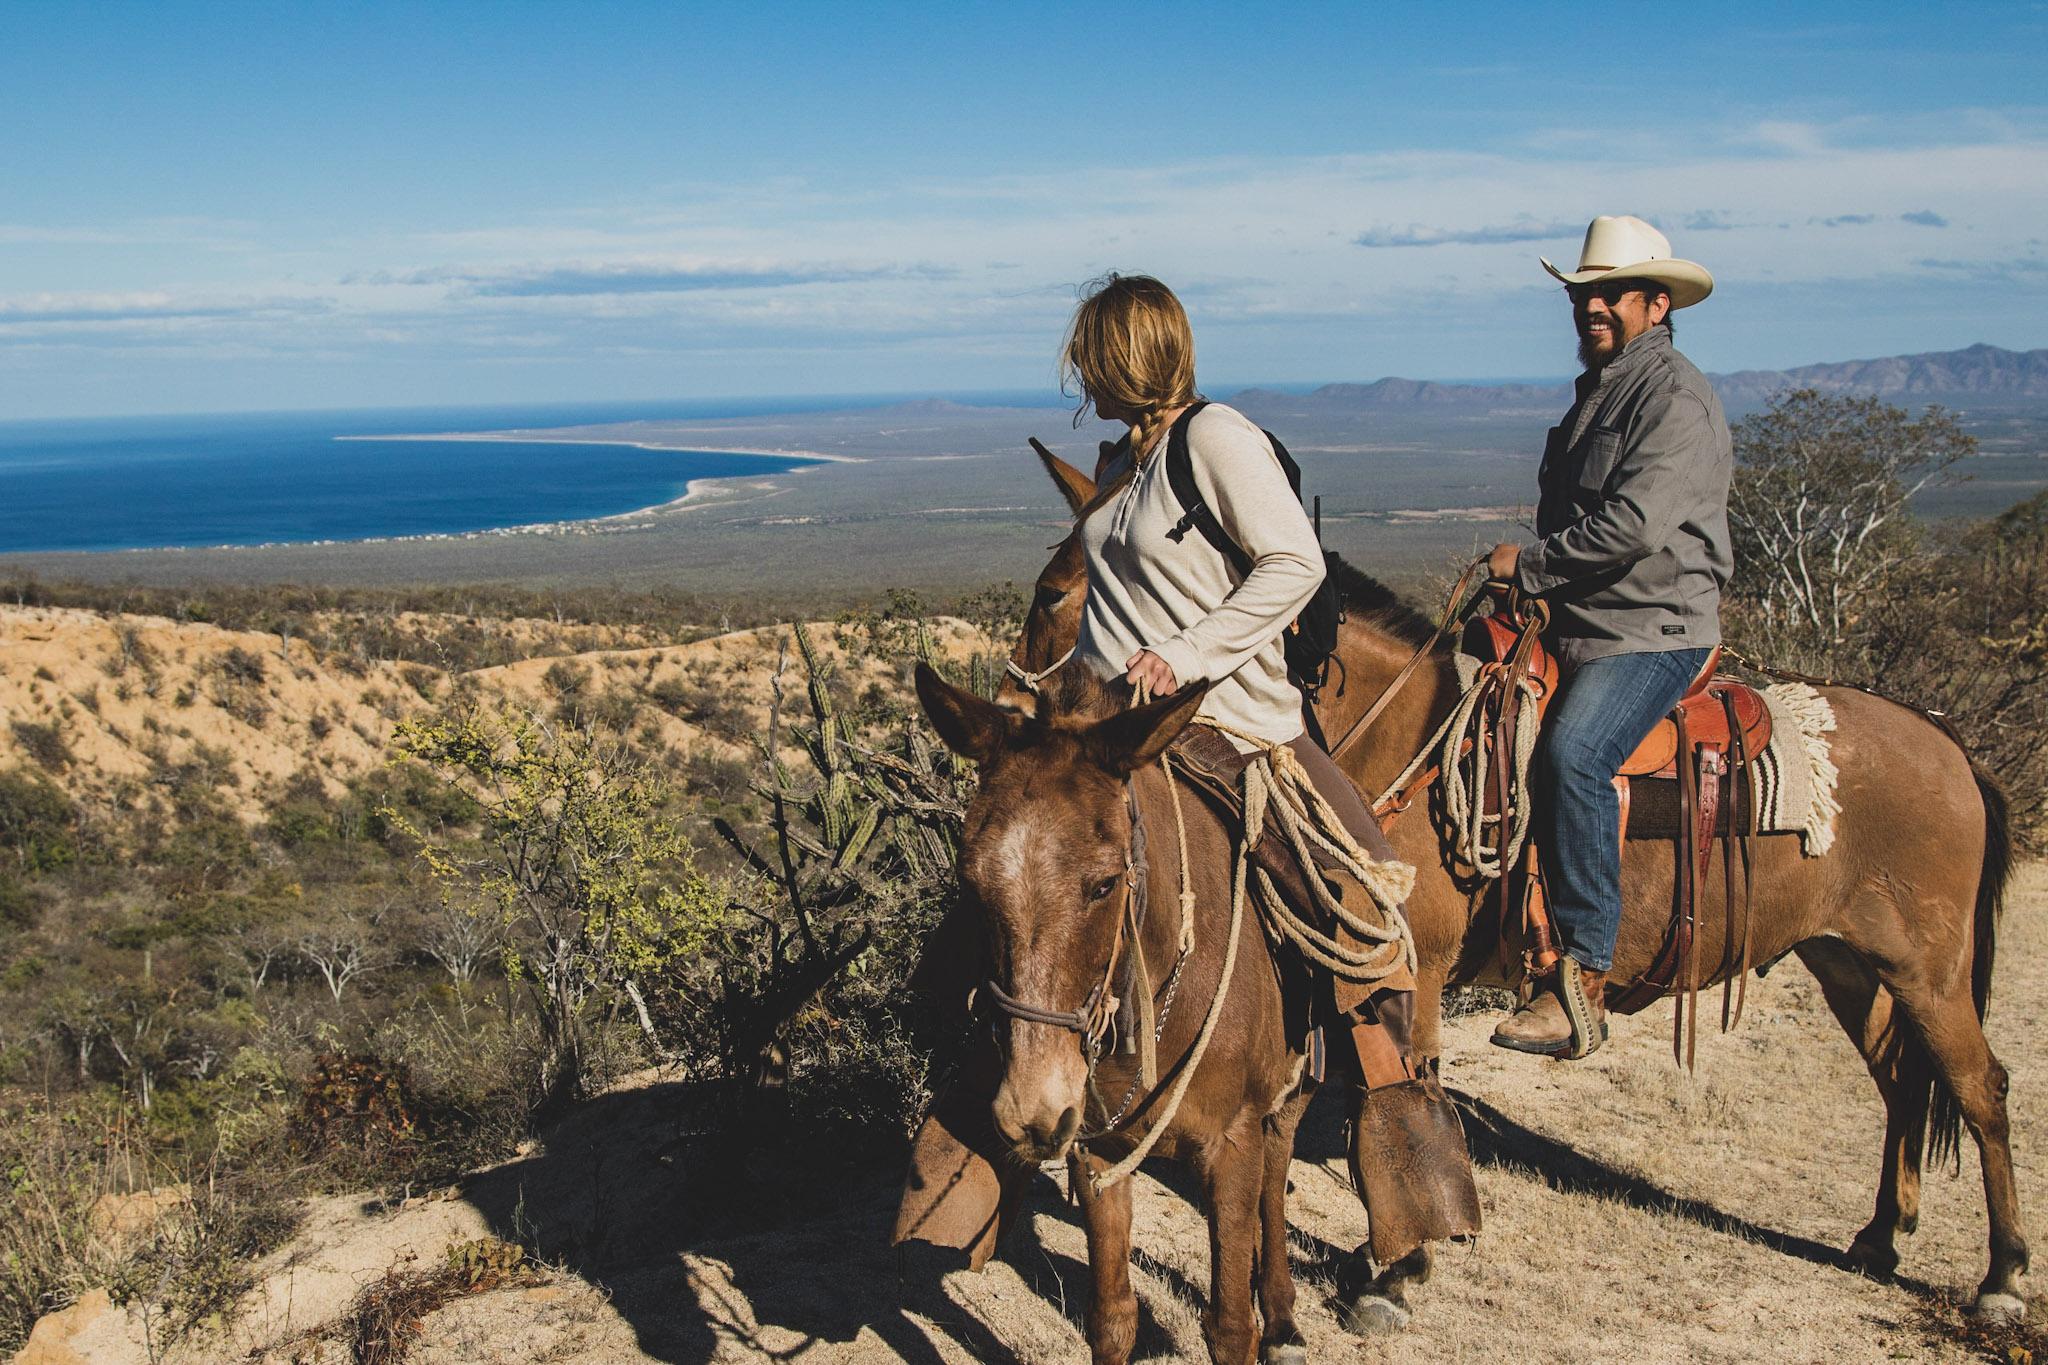 Baja-Mule-Riding-Views.jpg